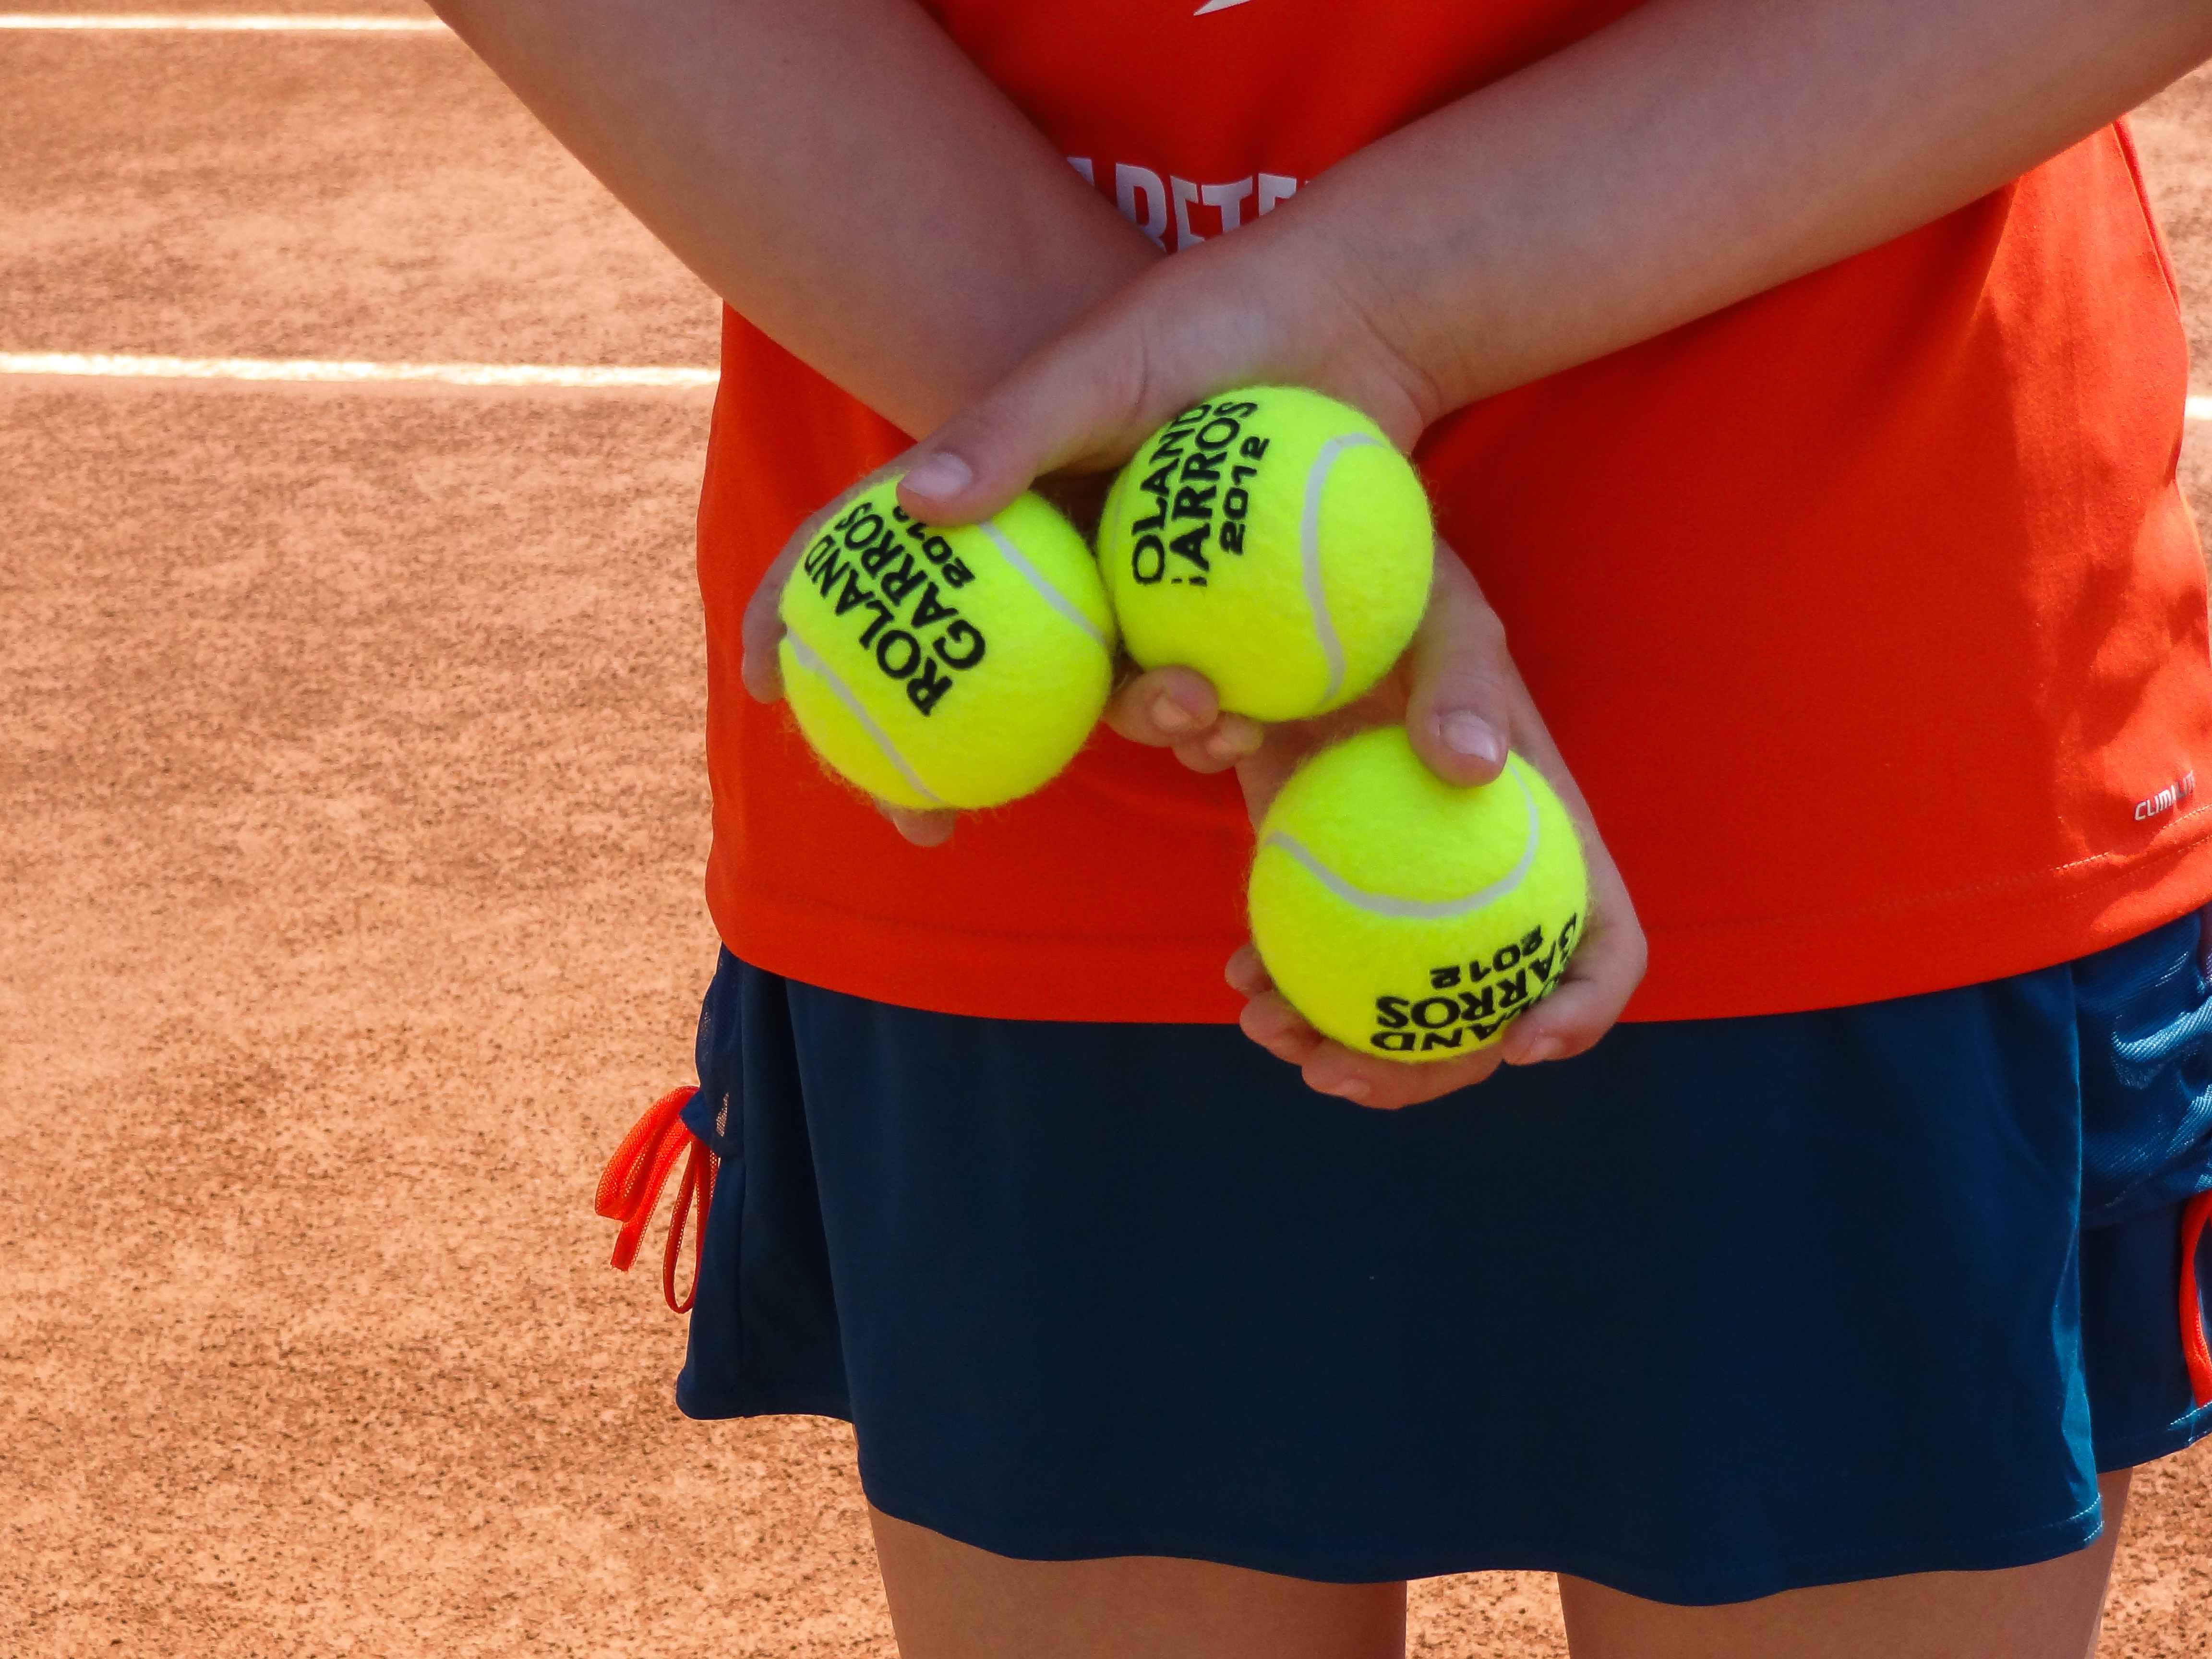 Headly Heavy Yellow Cricket Tennis Ball Pack of 3 UK